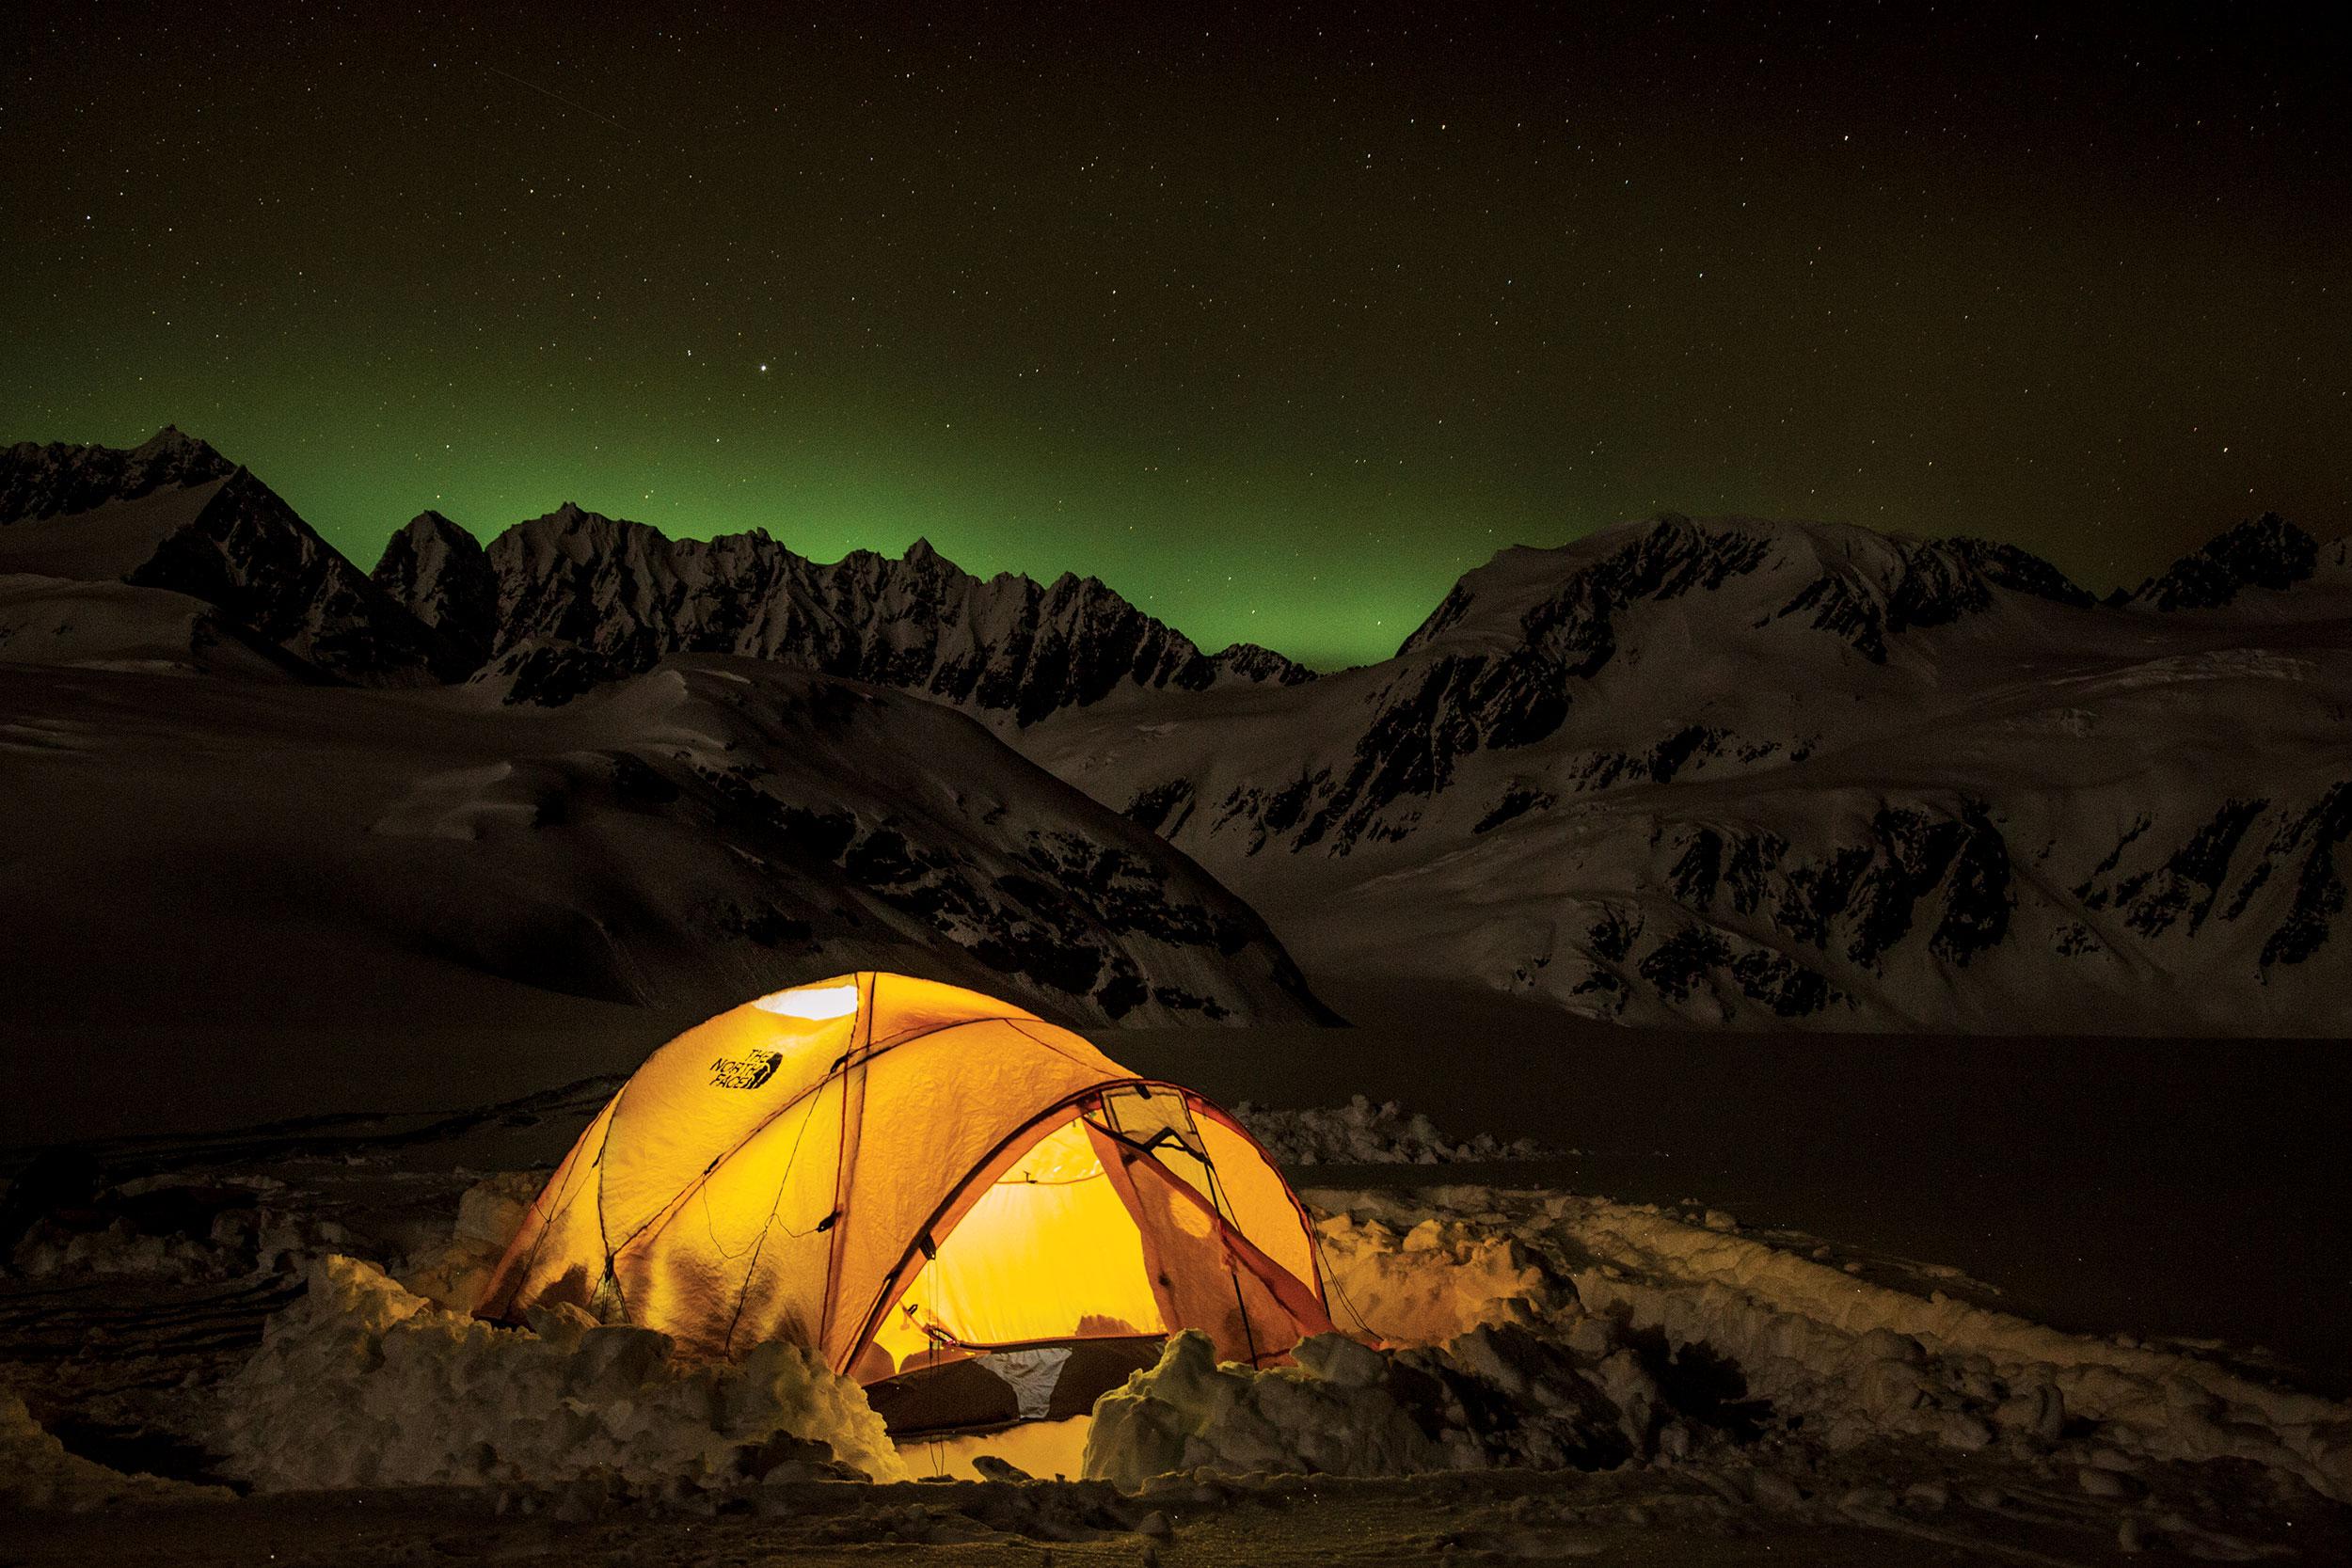 Glacier_Camp_Haines_Alaska_Zach_Clanton.jpg